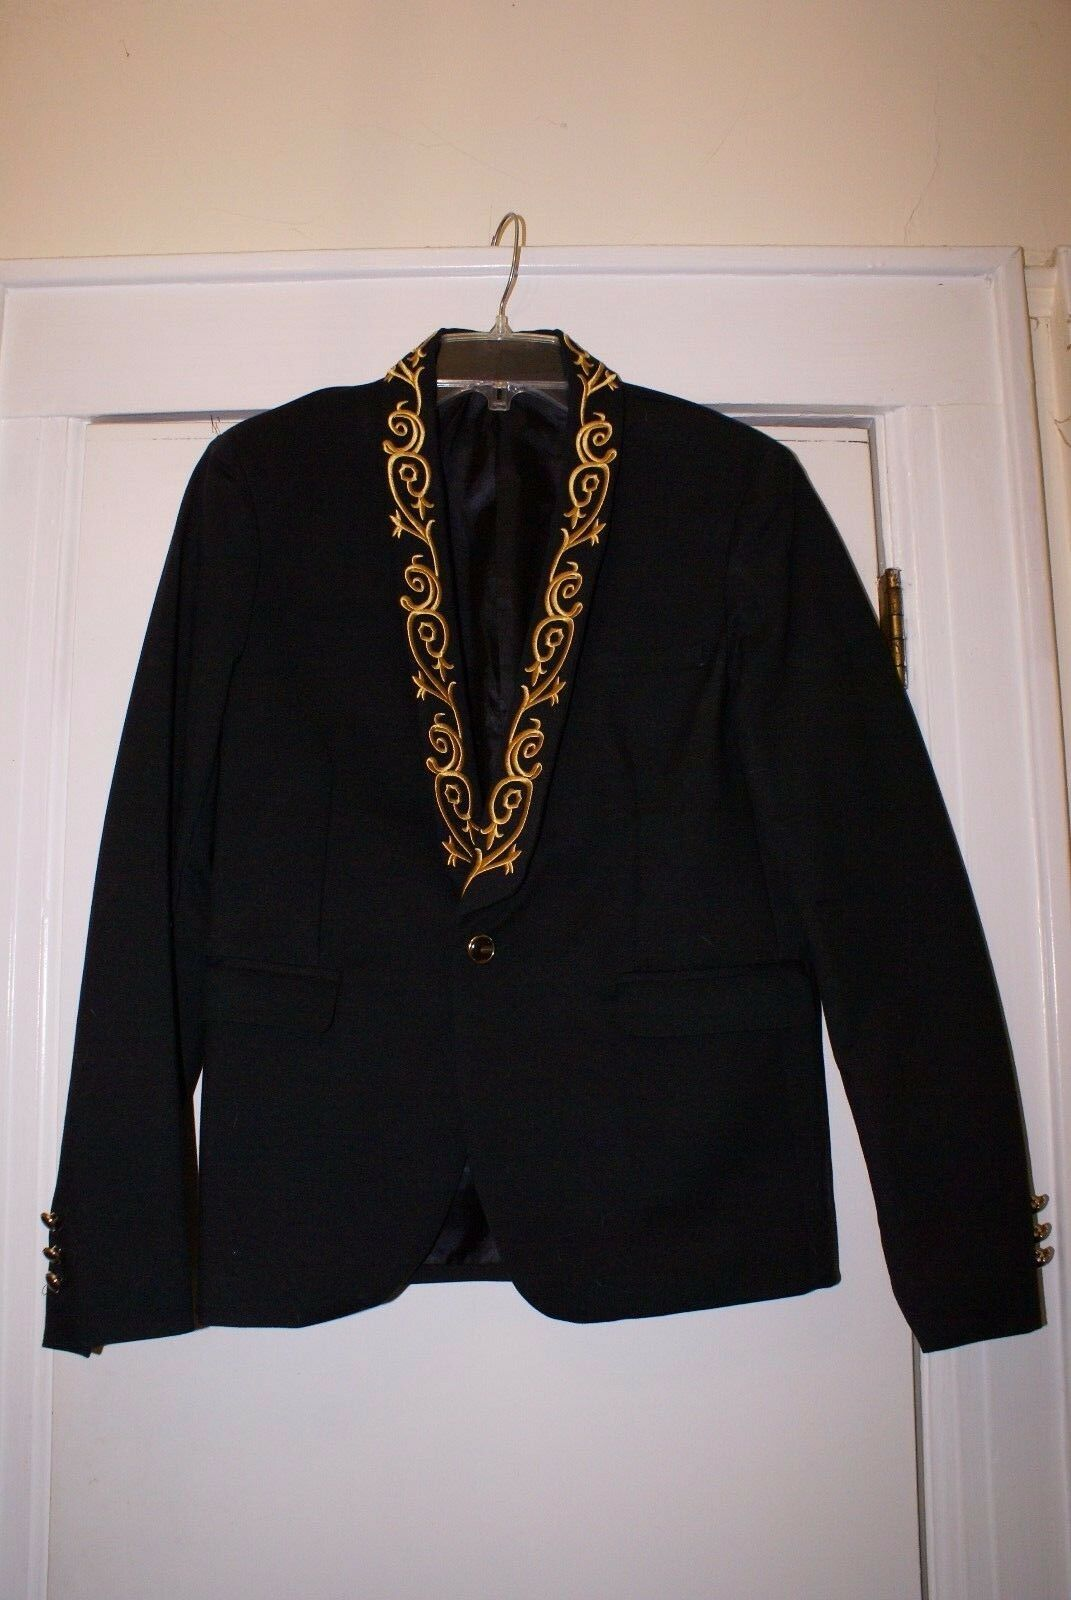 golden Embroidery Embroidery Embroidery Embellished Button Fly Lapel Slimming Fashion Design Long Slee fa4b36